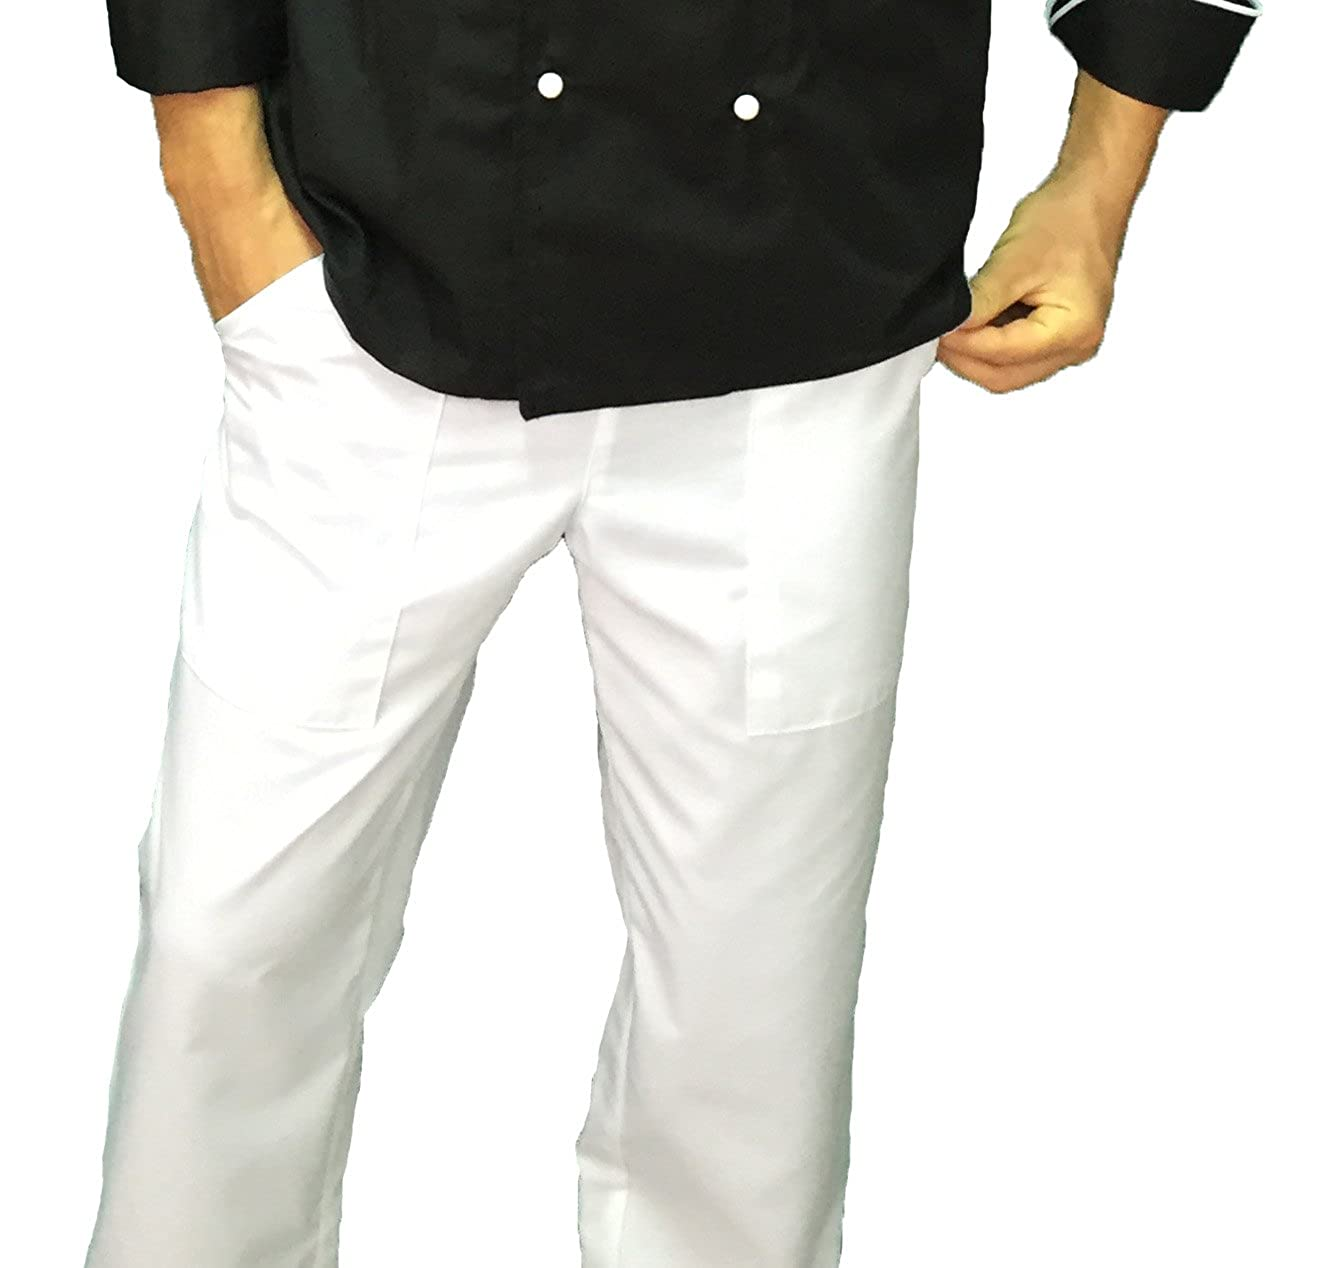 tessile astorino Pantalone Cuoco Chef, Vari Colori, Made in Italy